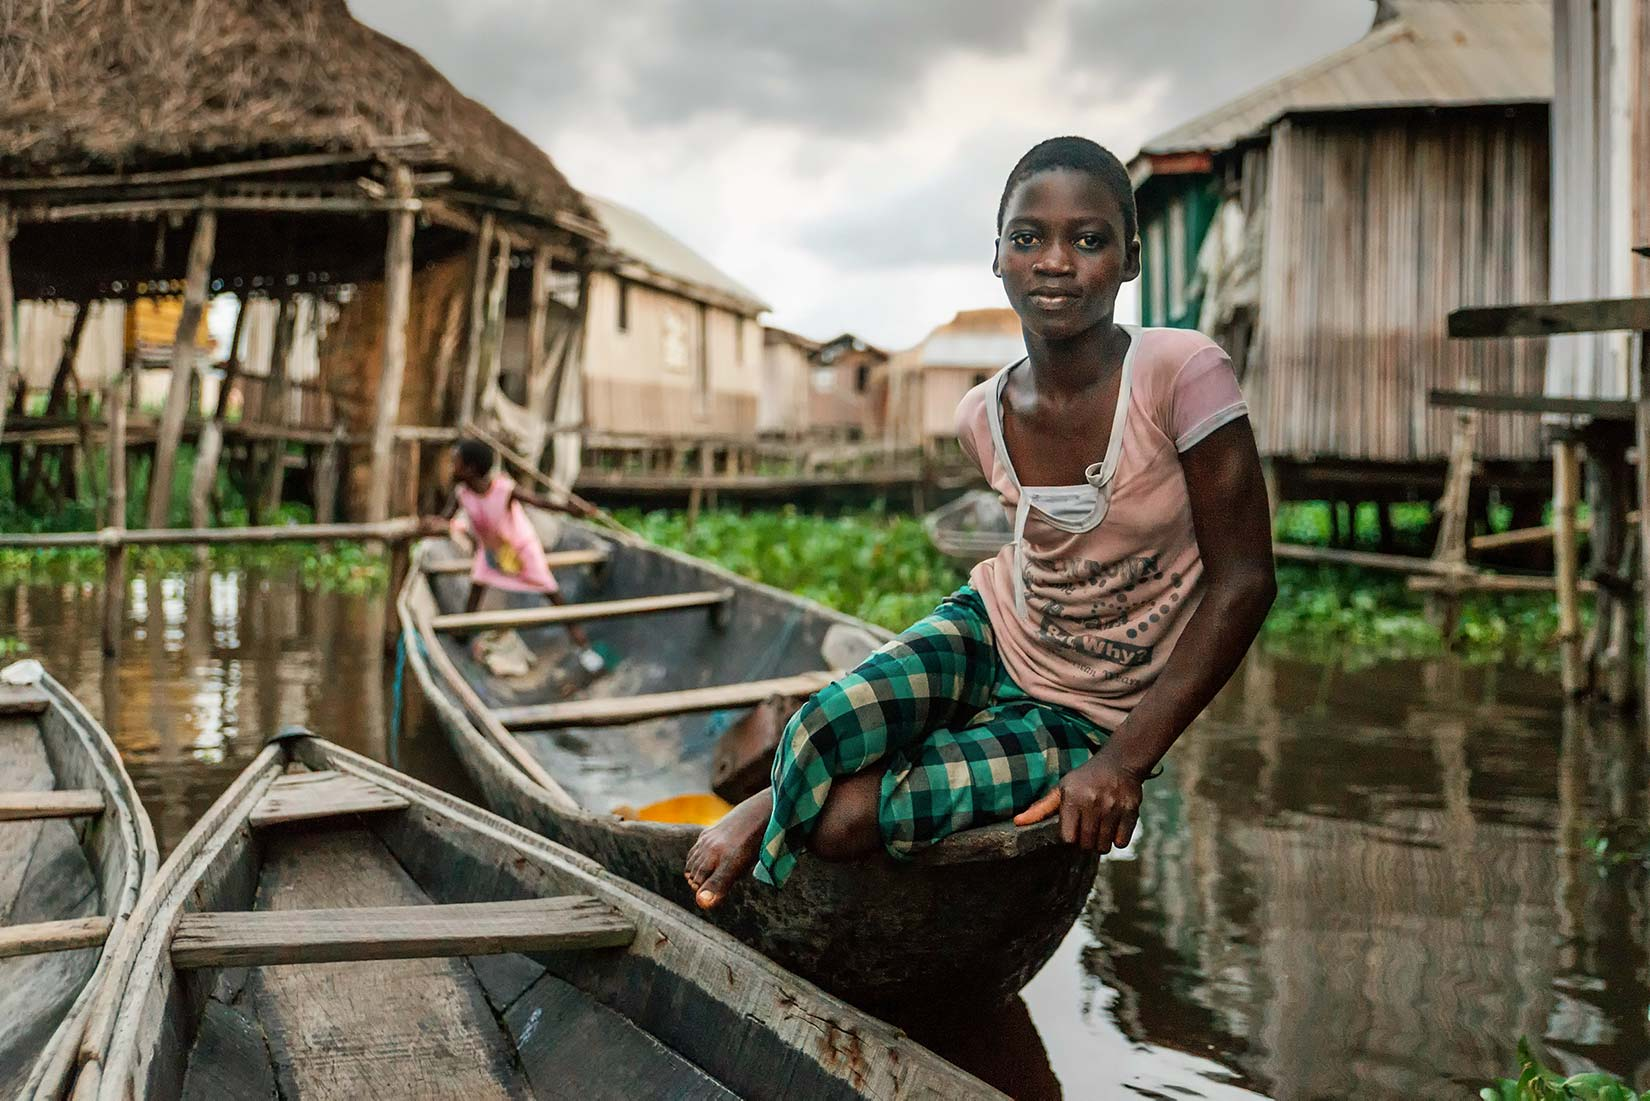 Near Ganvié, a village on stilt houses in southern Benin...